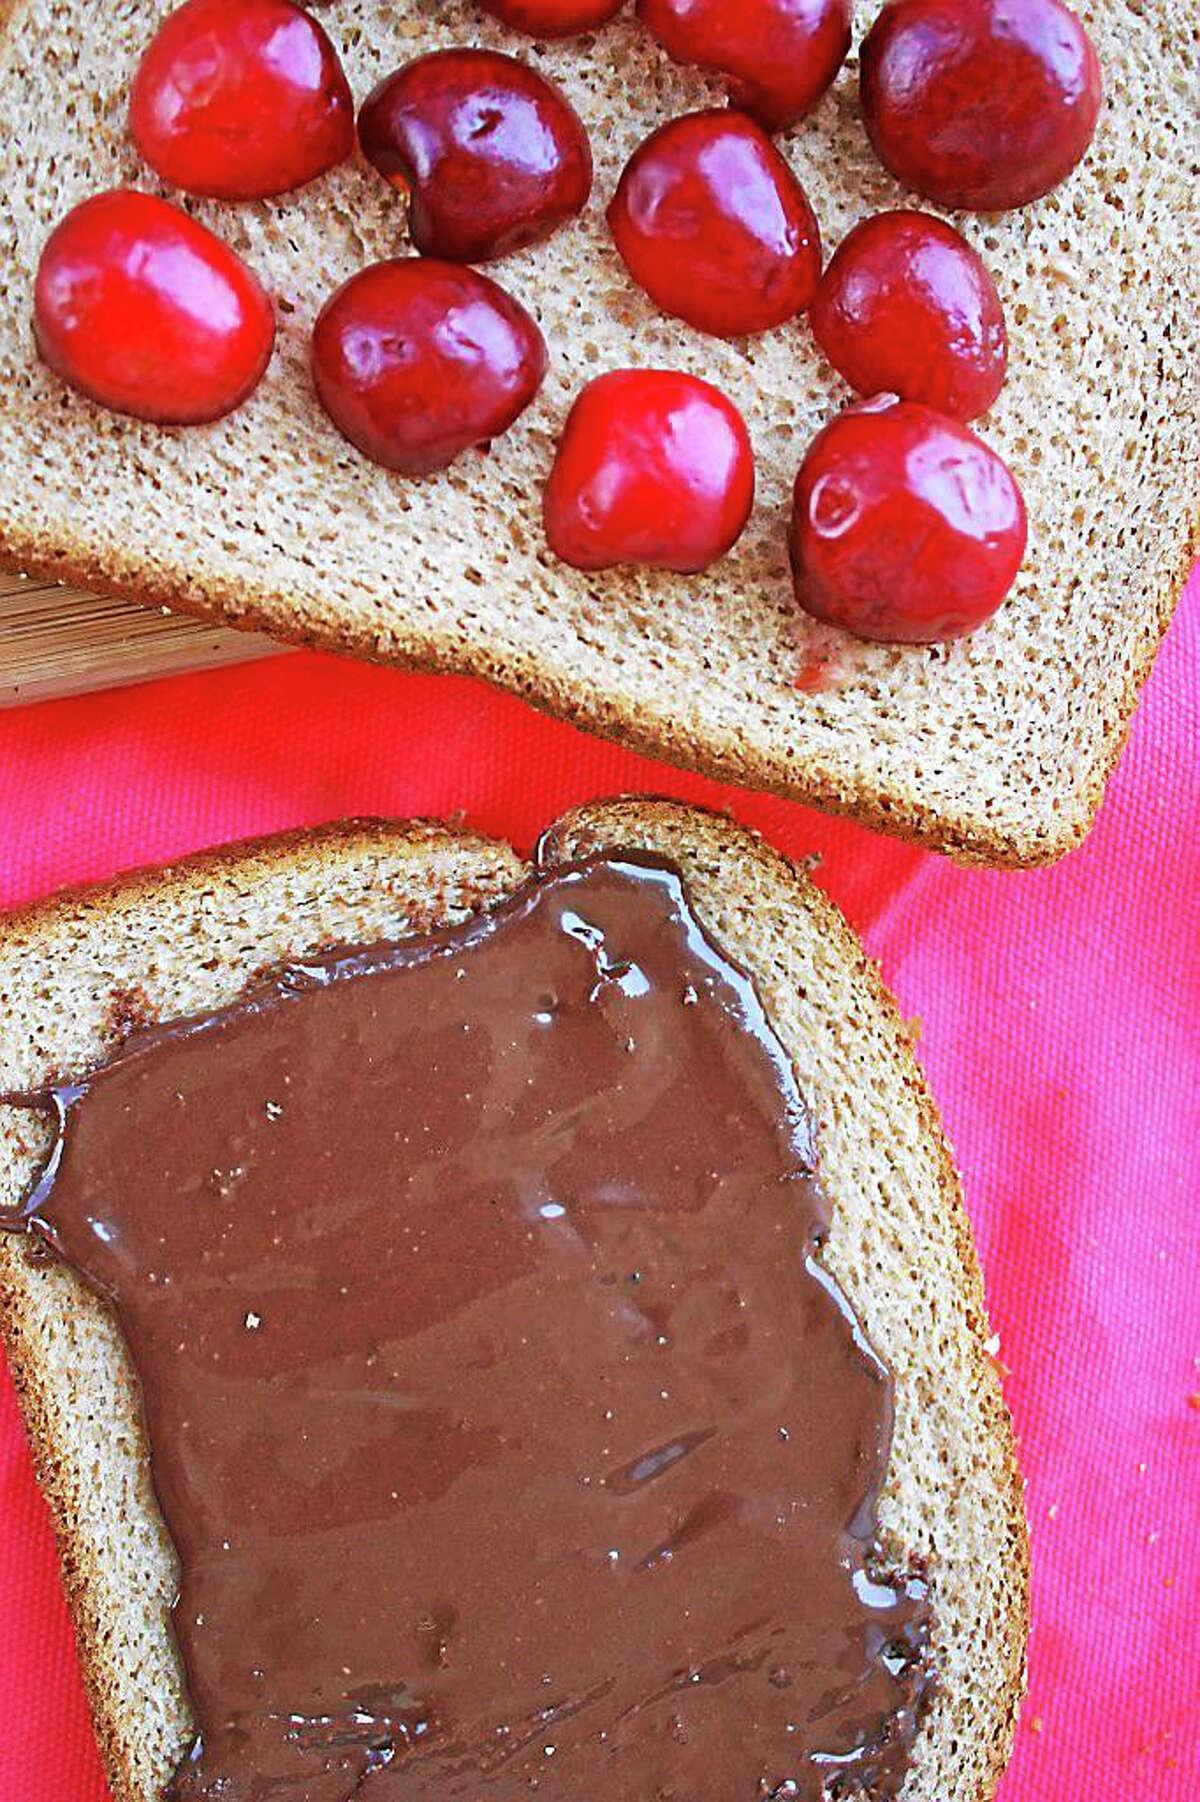 Creamy vegan Chocolate Hazelnut Spread is a low-cost alternative to brand-name options.